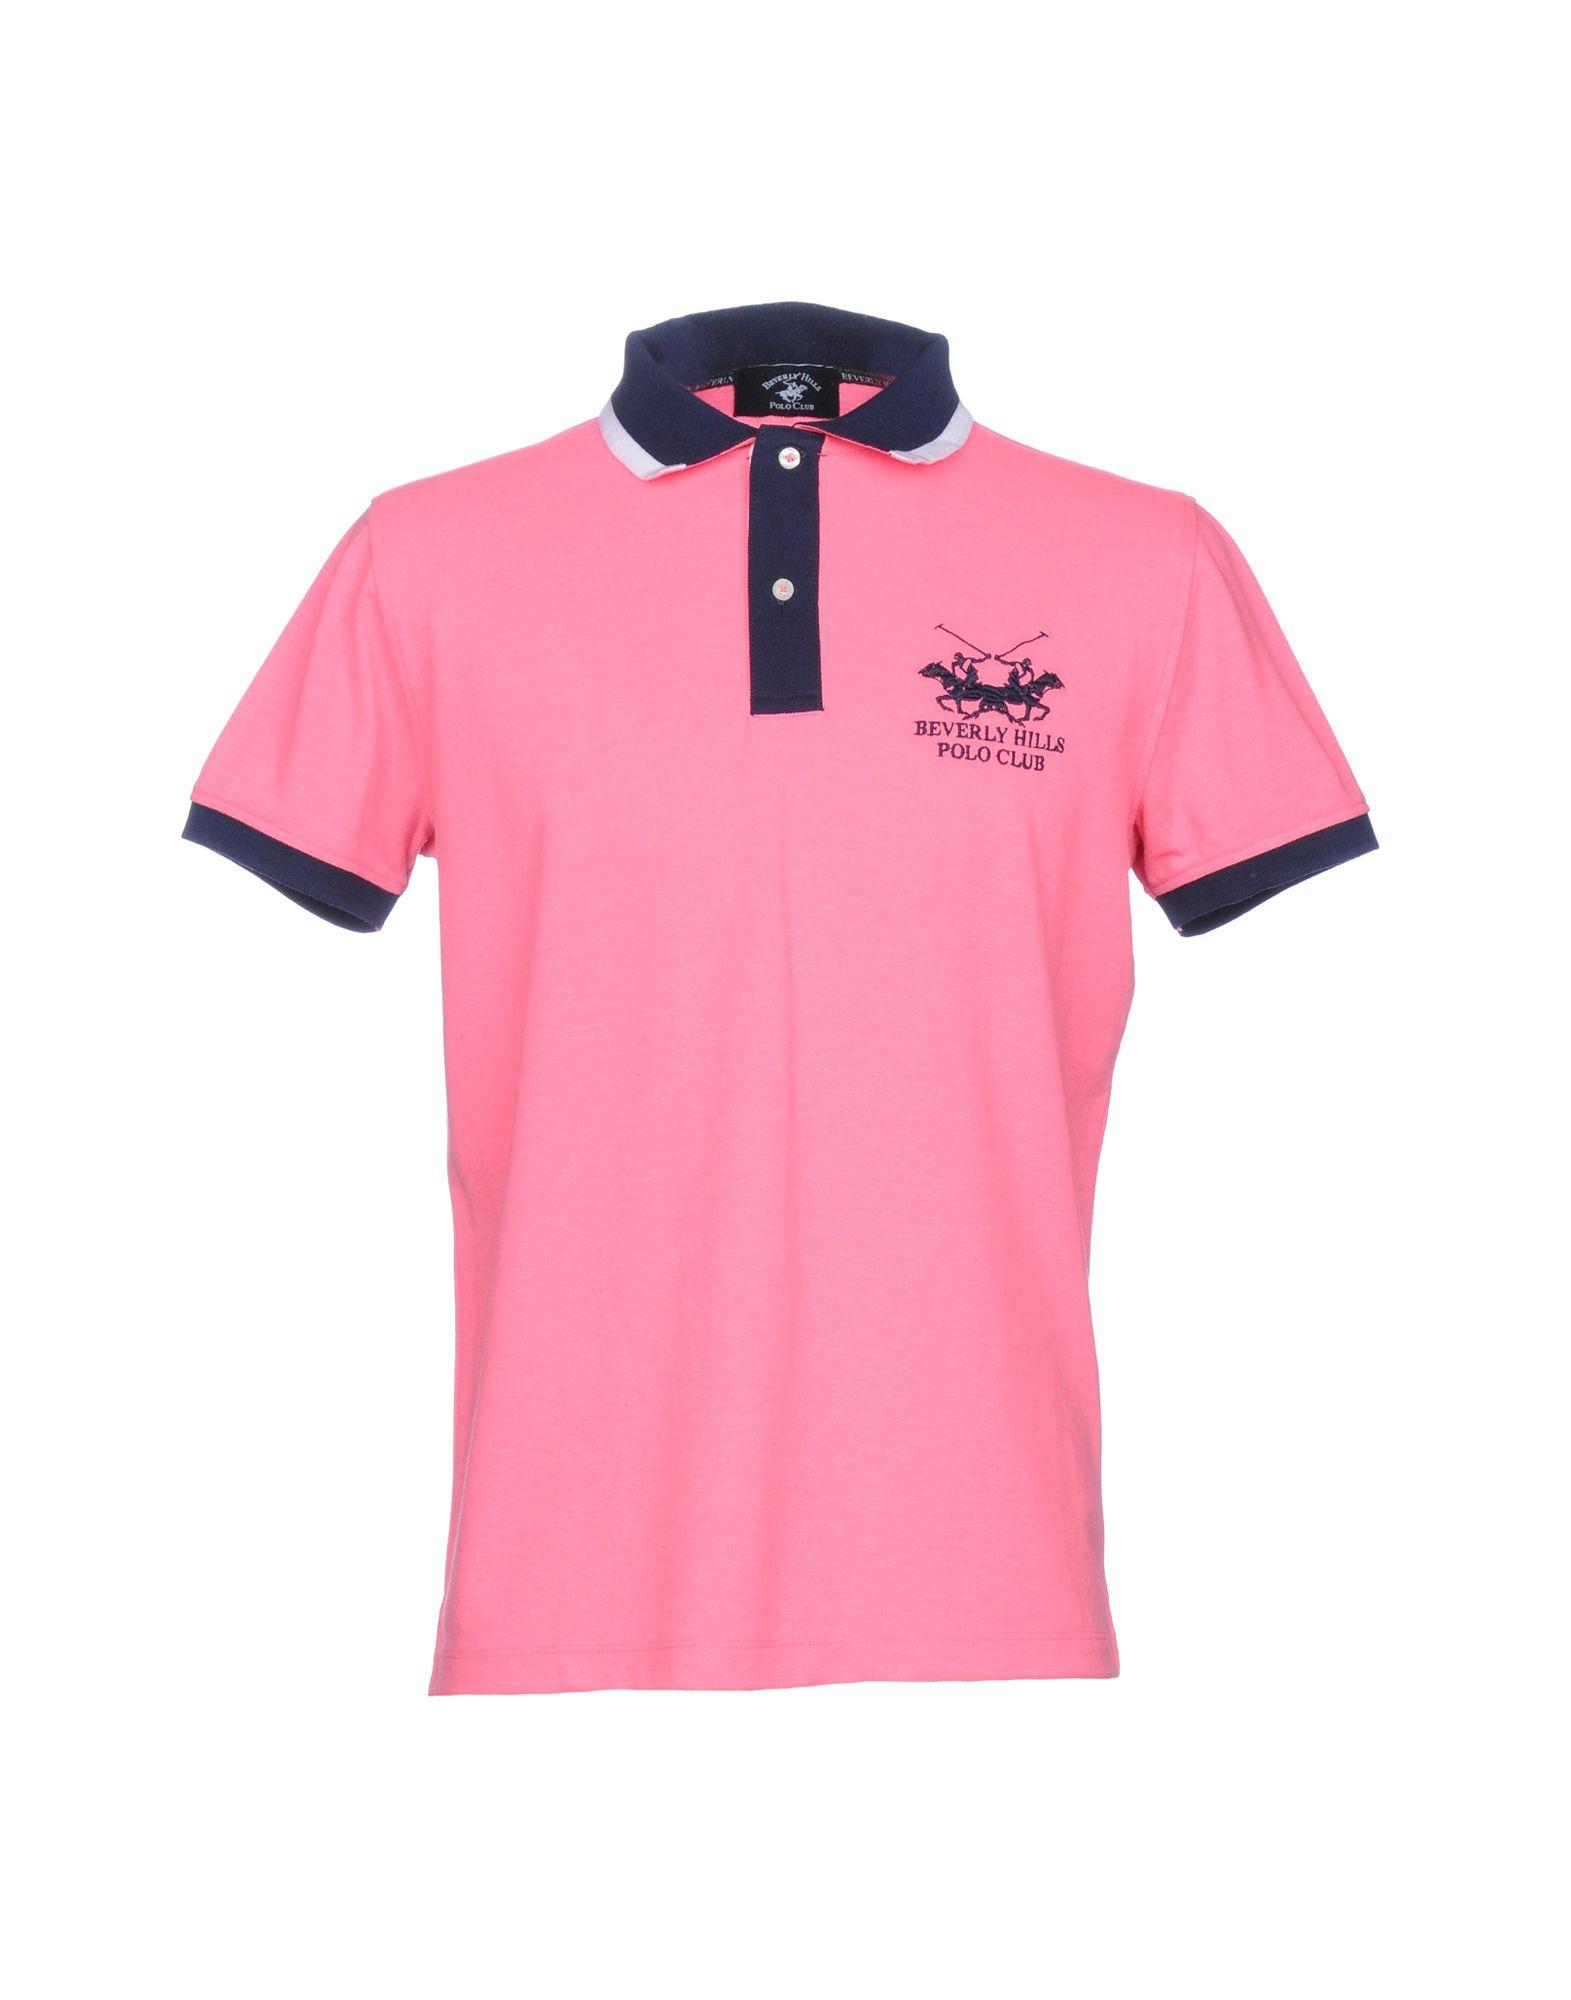 c89861cd6 Beverly Hills Polo Club Polo Shirt - Men Beverly Hills Polo Club Polo  Shirts online on YOOX Hong Kong - 12160188FT